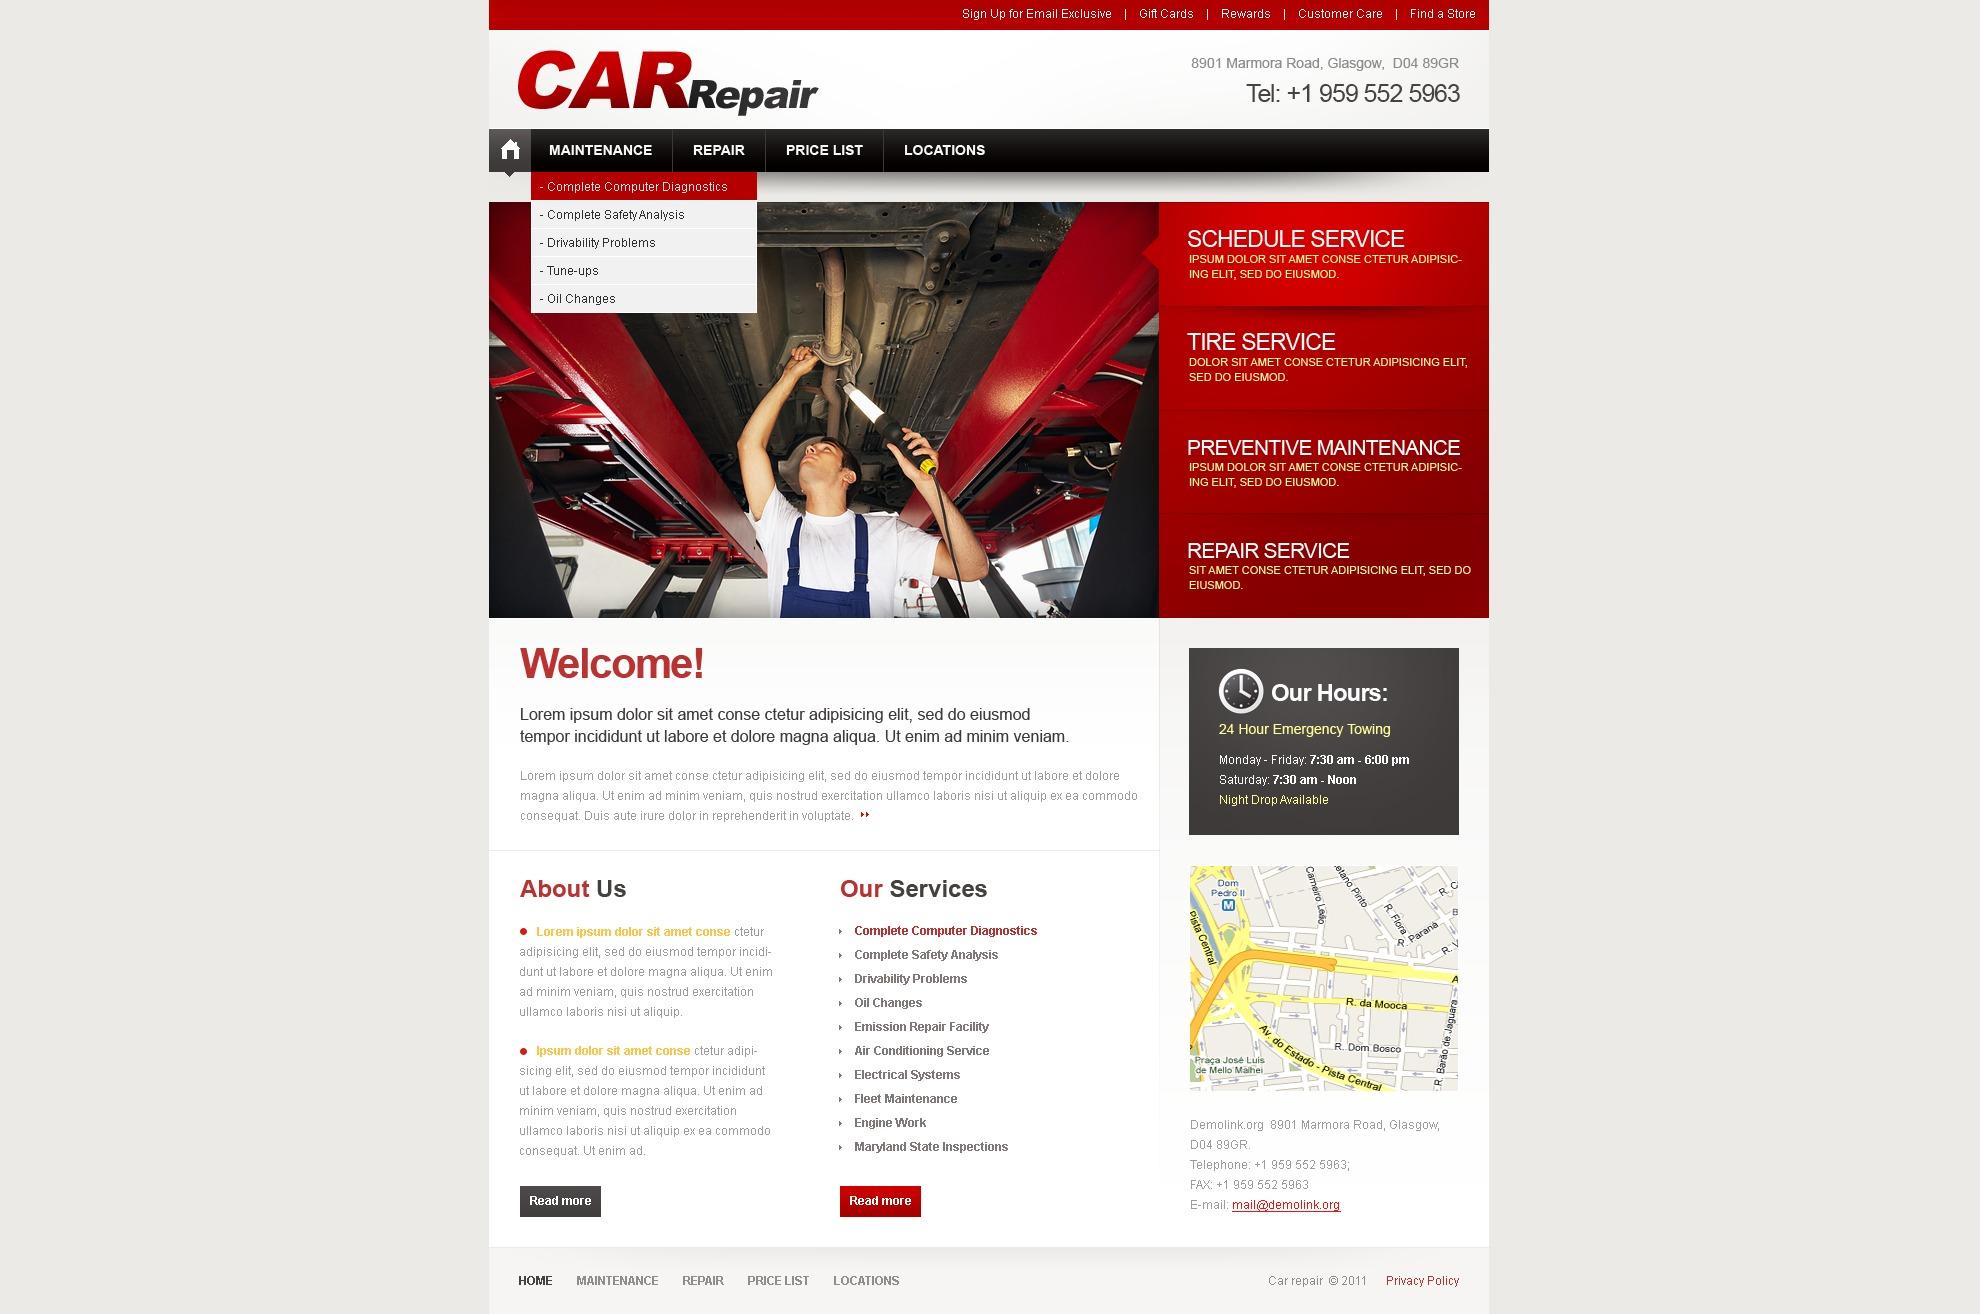 car repair website template 36645. Black Bedroom Furniture Sets. Home Design Ideas